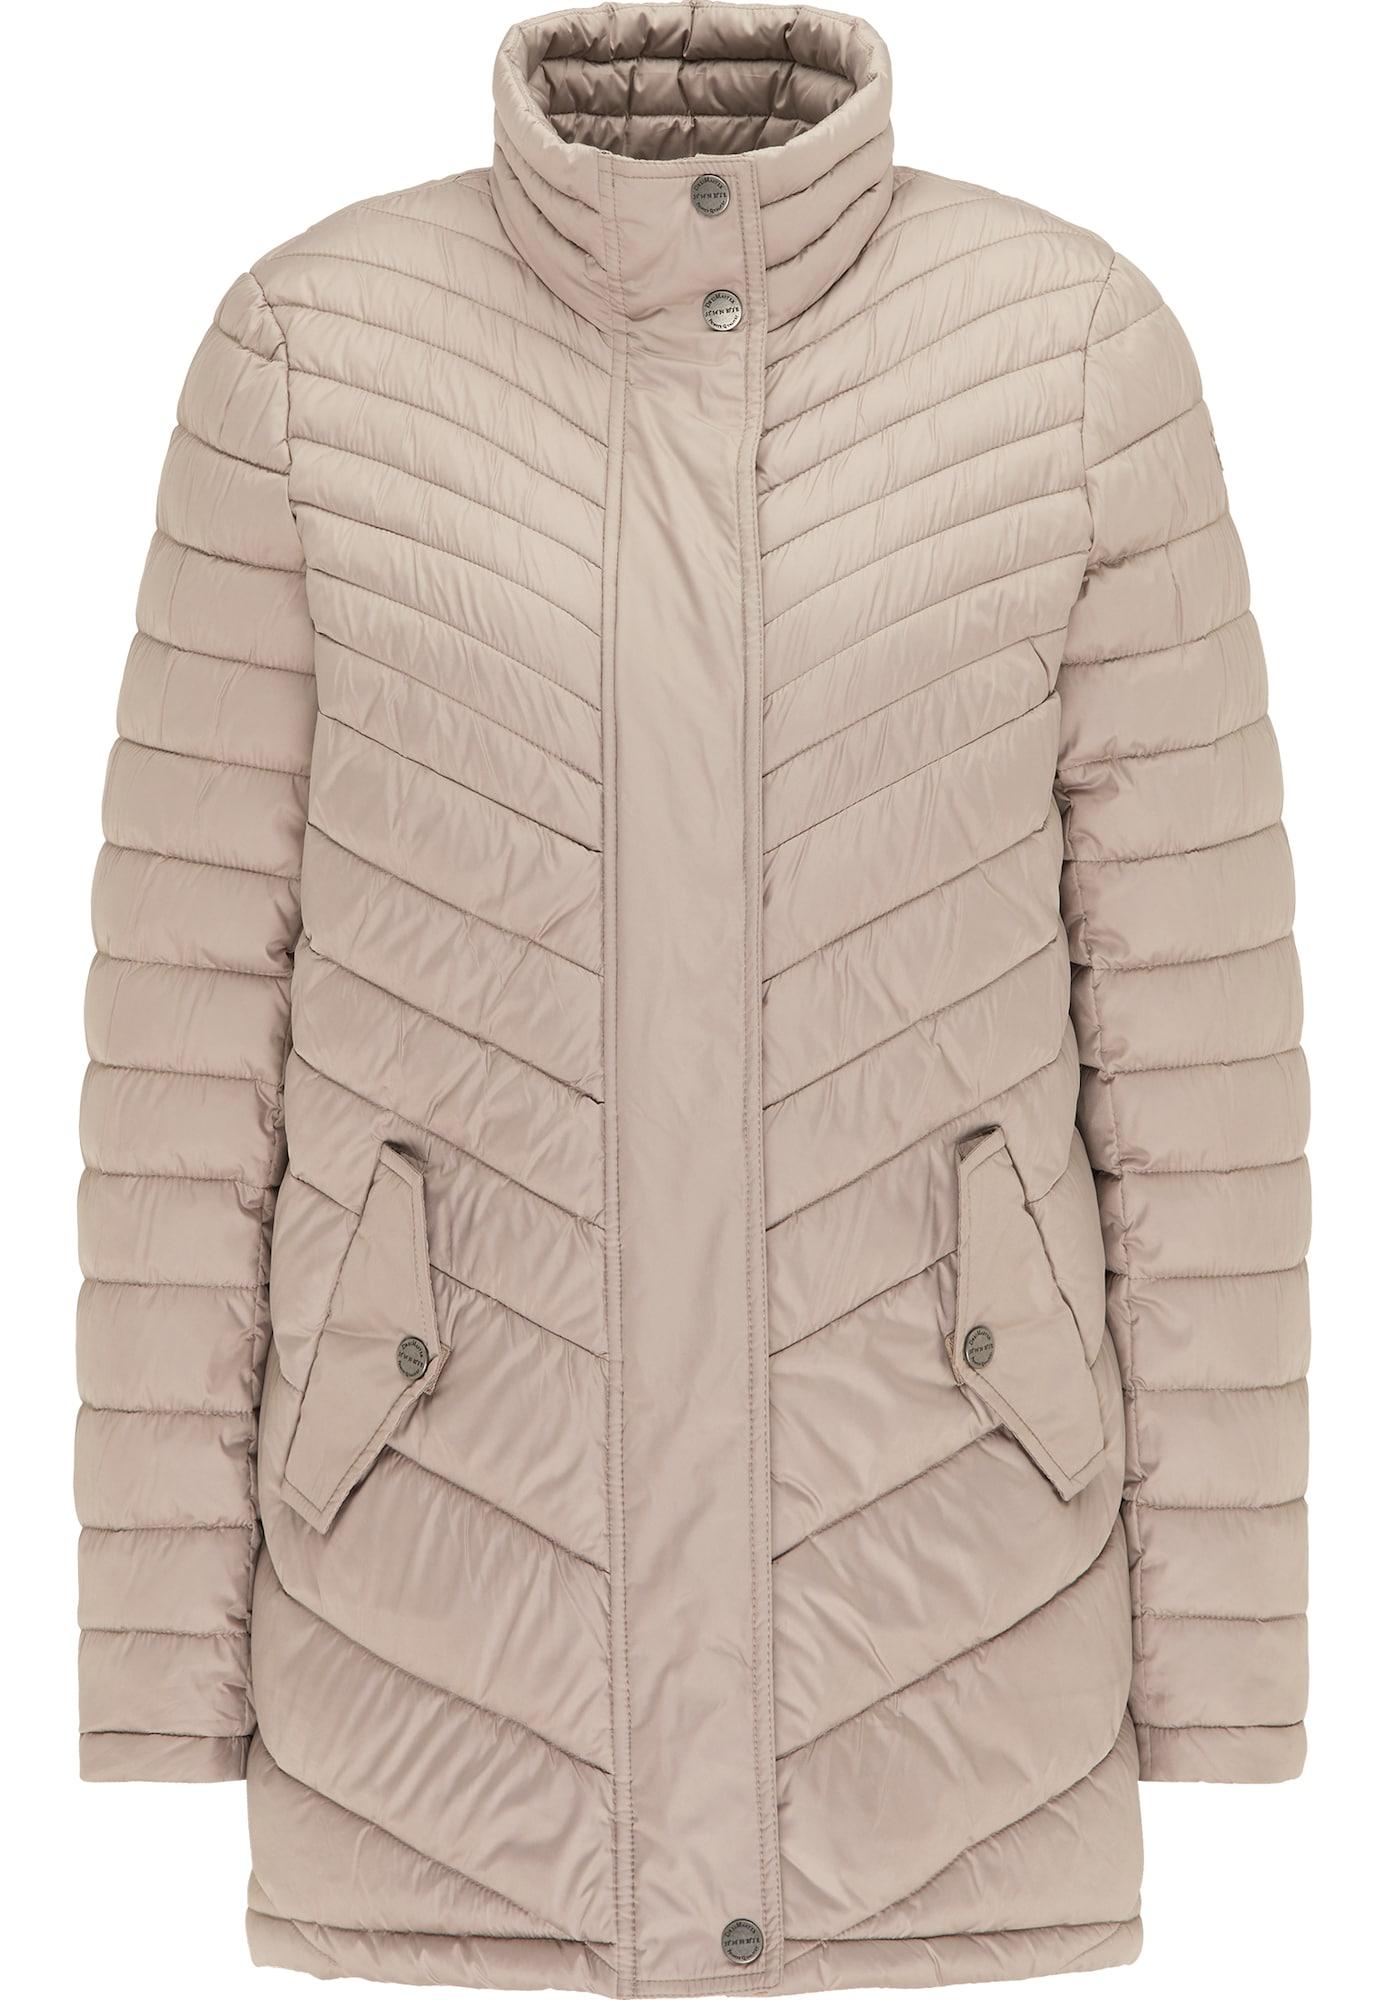 DreiMaster Klassik Žieminis paltas pudros spalva